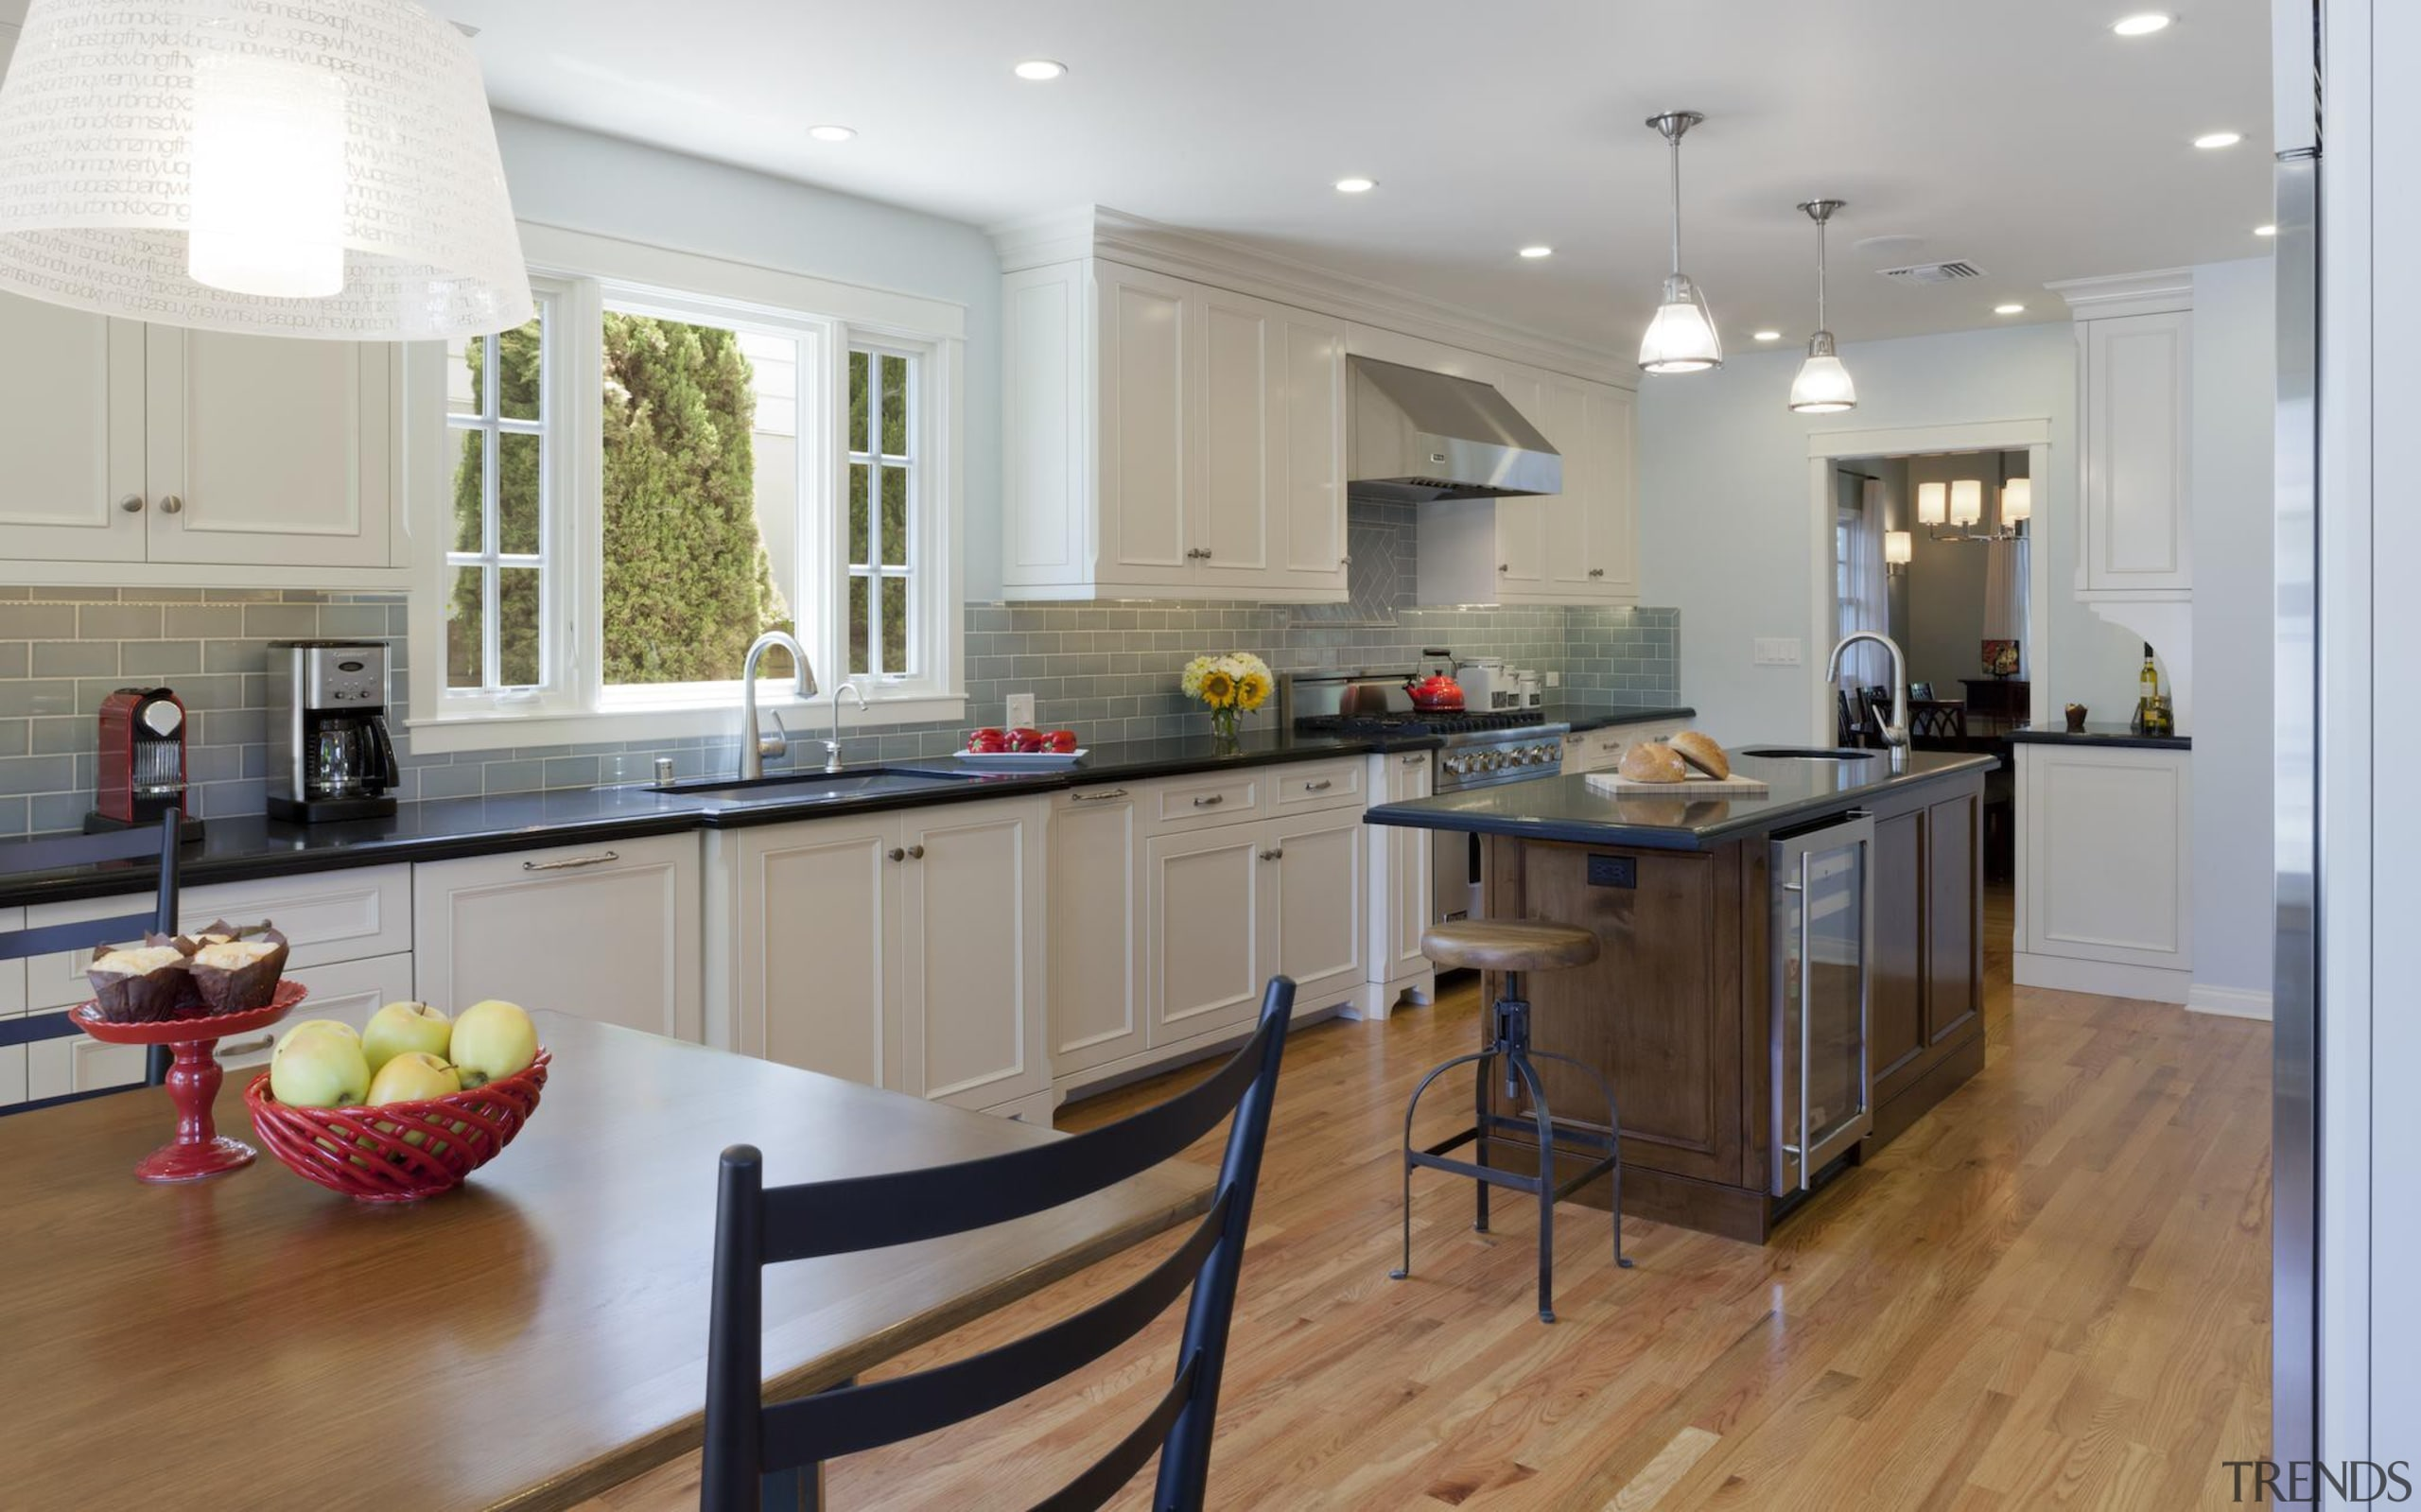 kitchen 01.jpg - kitchen_01.jpg - cabinetry   countertop cabinetry, countertop, cuisine classique, floor, flooring, hardwood, interior design, kitchen, laminate flooring, real estate, room, wood flooring, gray